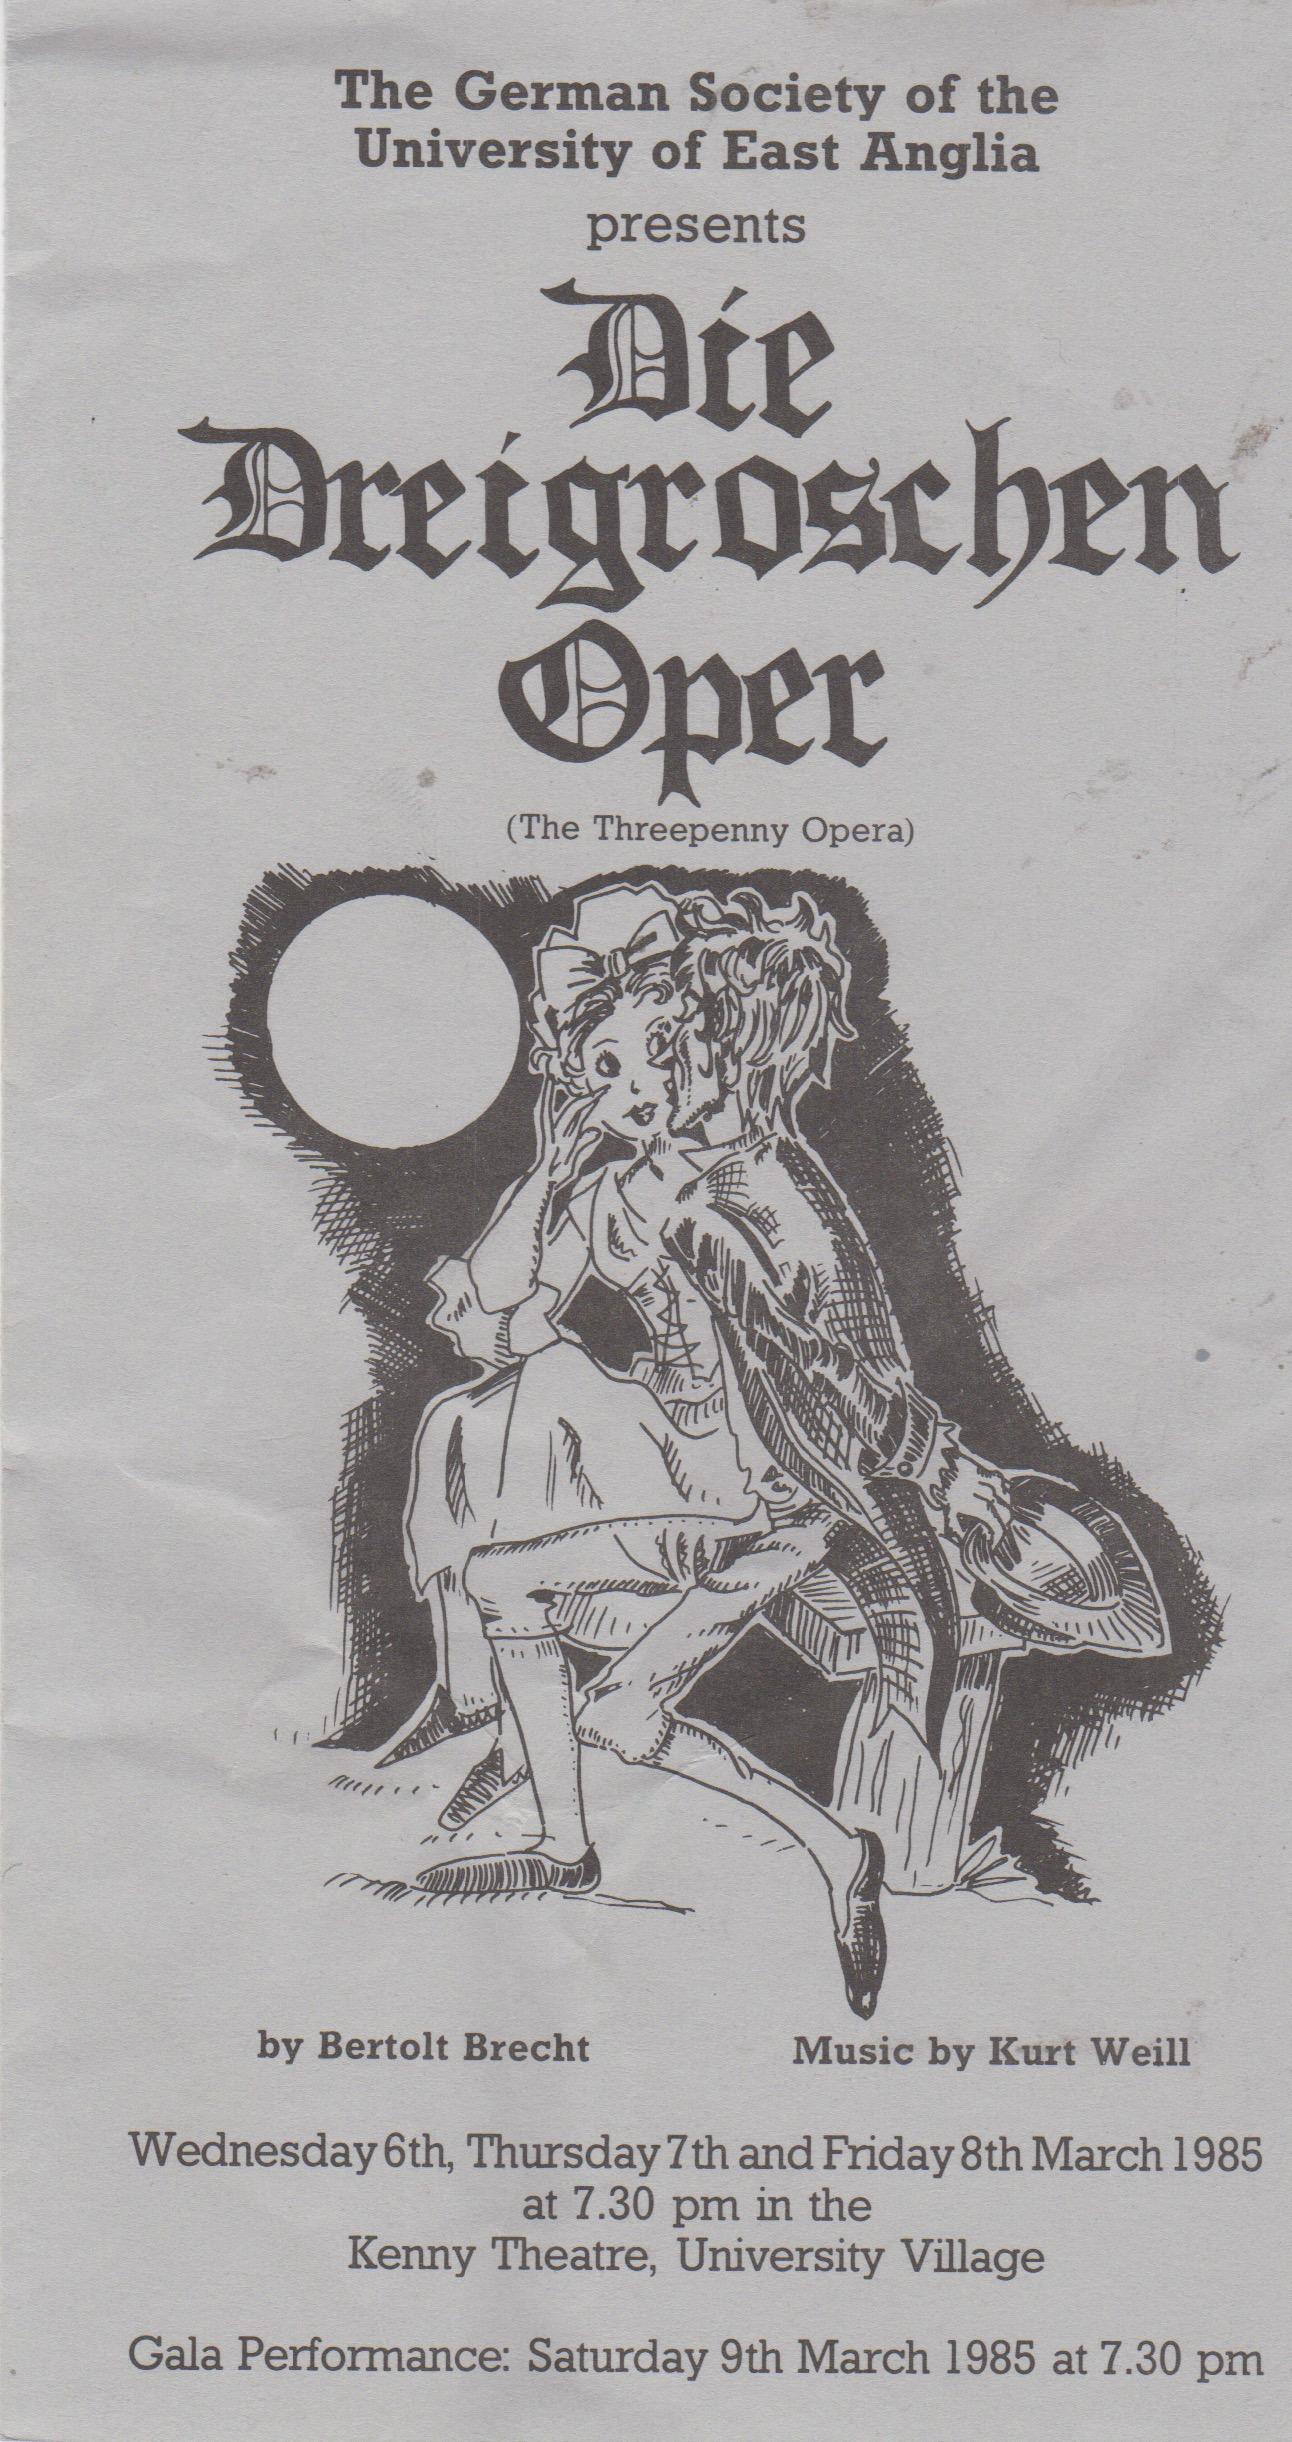 german theepenny opera.jpeg